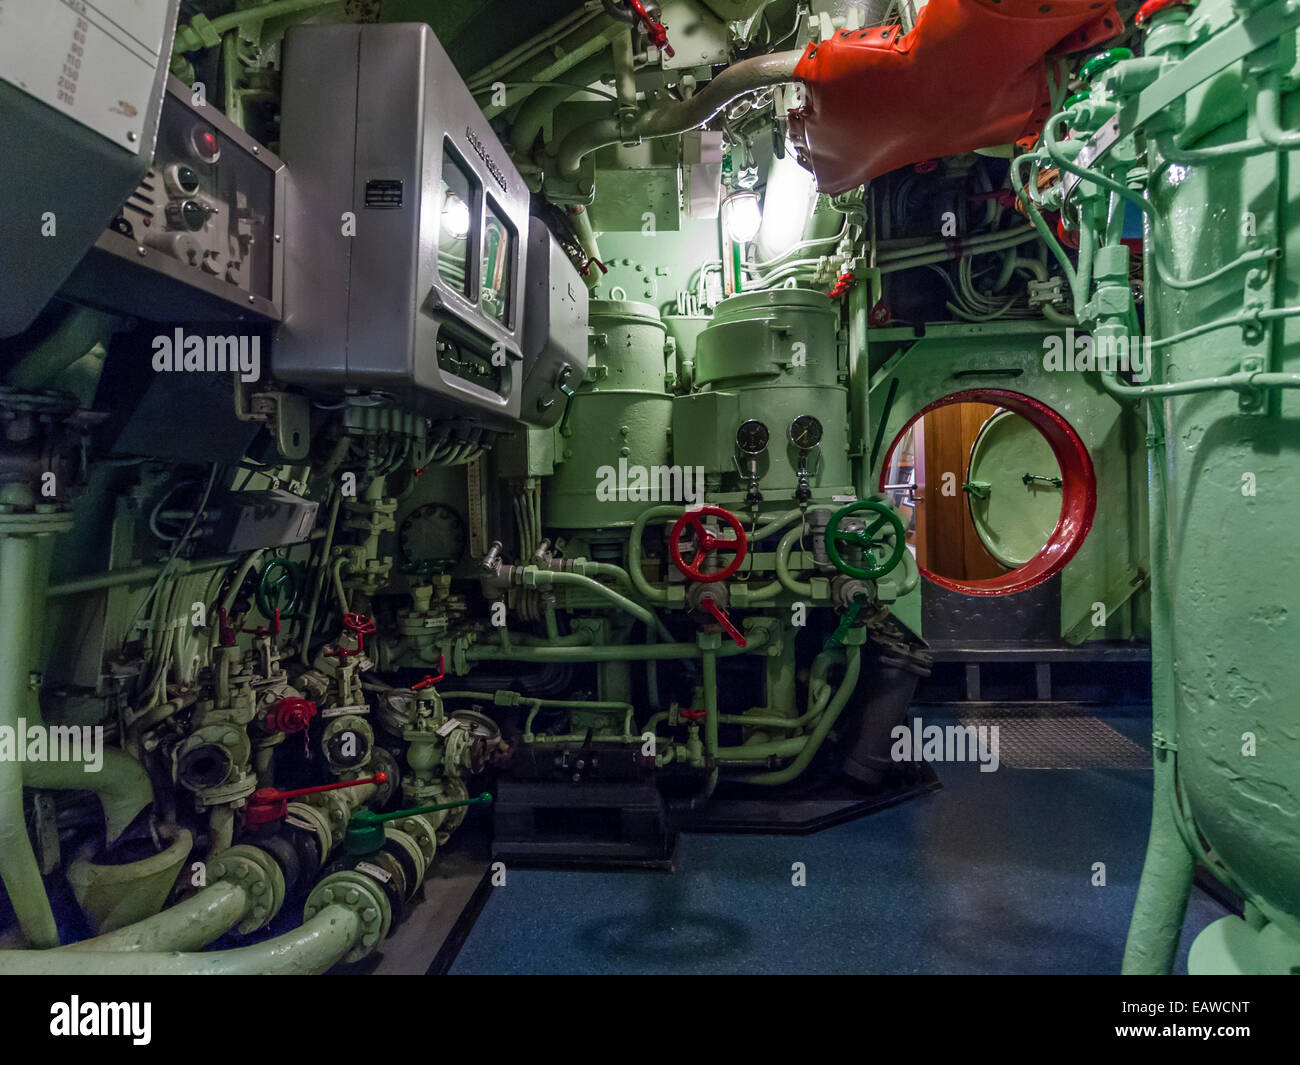 "Engine room of the historic German submarine U-2540 ""Wilhelm Bauer"", now a  museum ship in Bremerhafen, Germany."